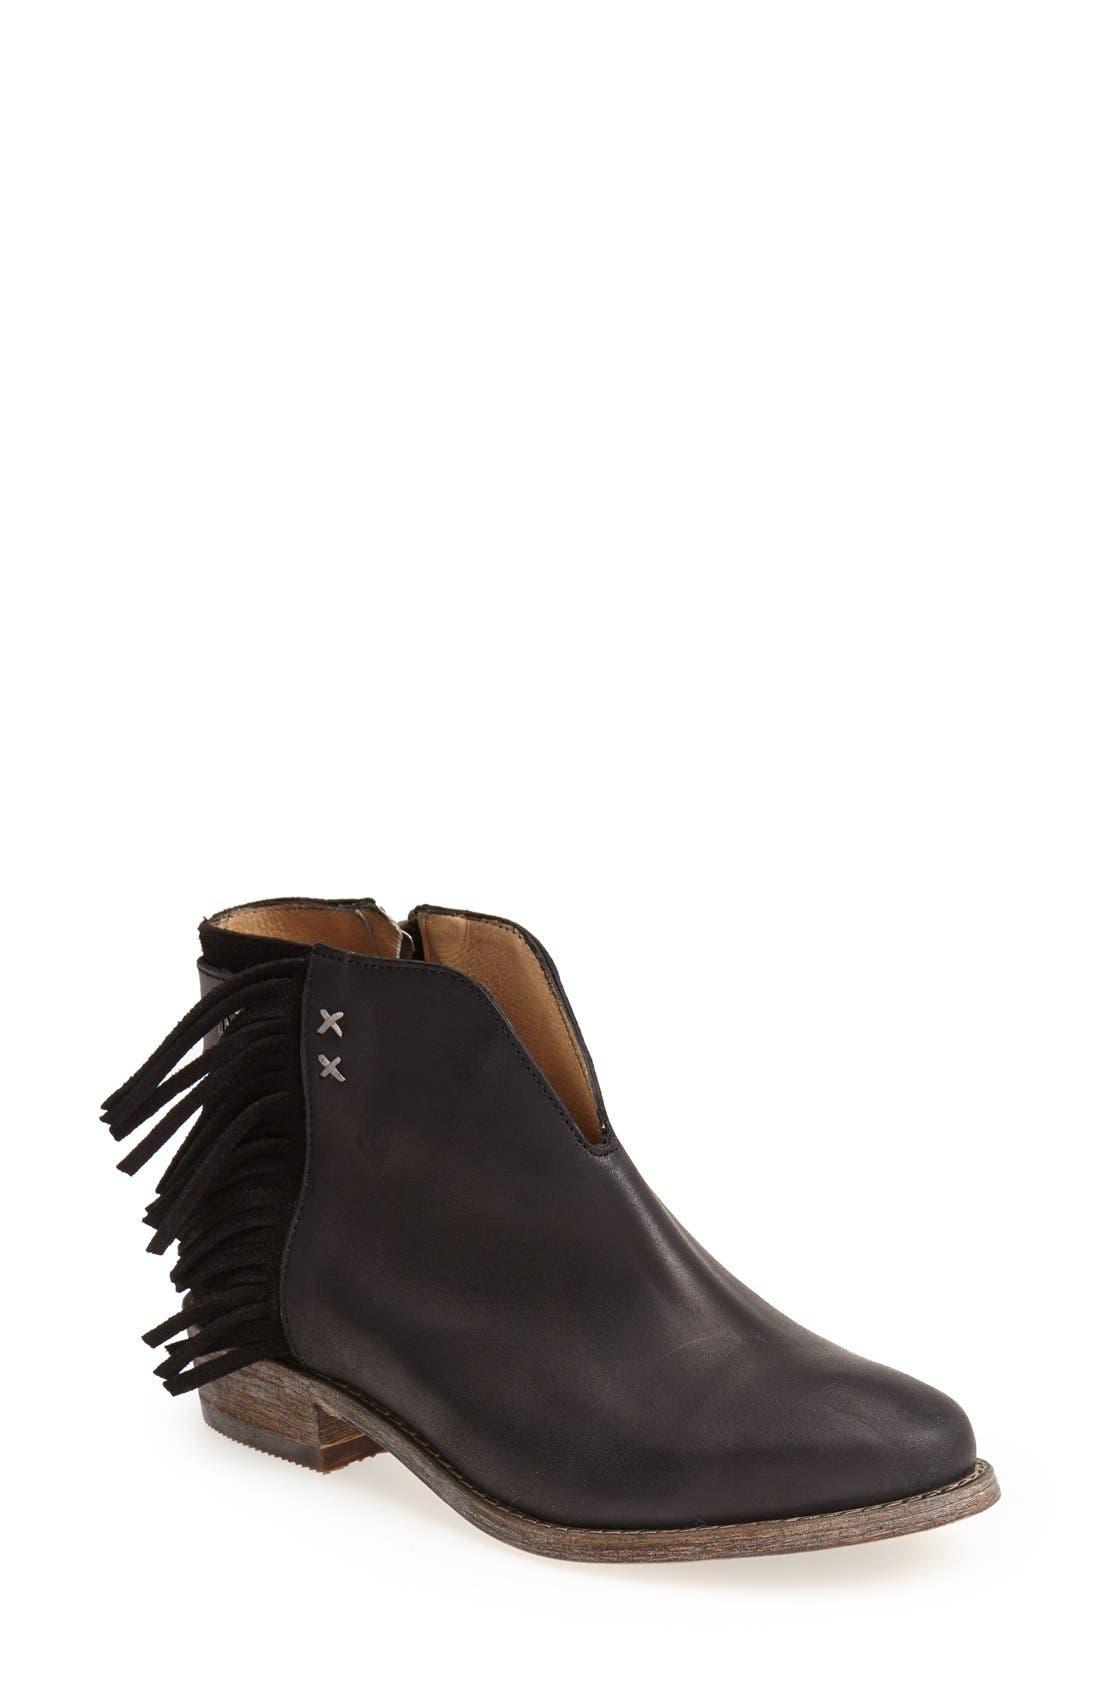 Main Image - Koolaburra 'Dallas' Fringed Leather Bootie (Women)